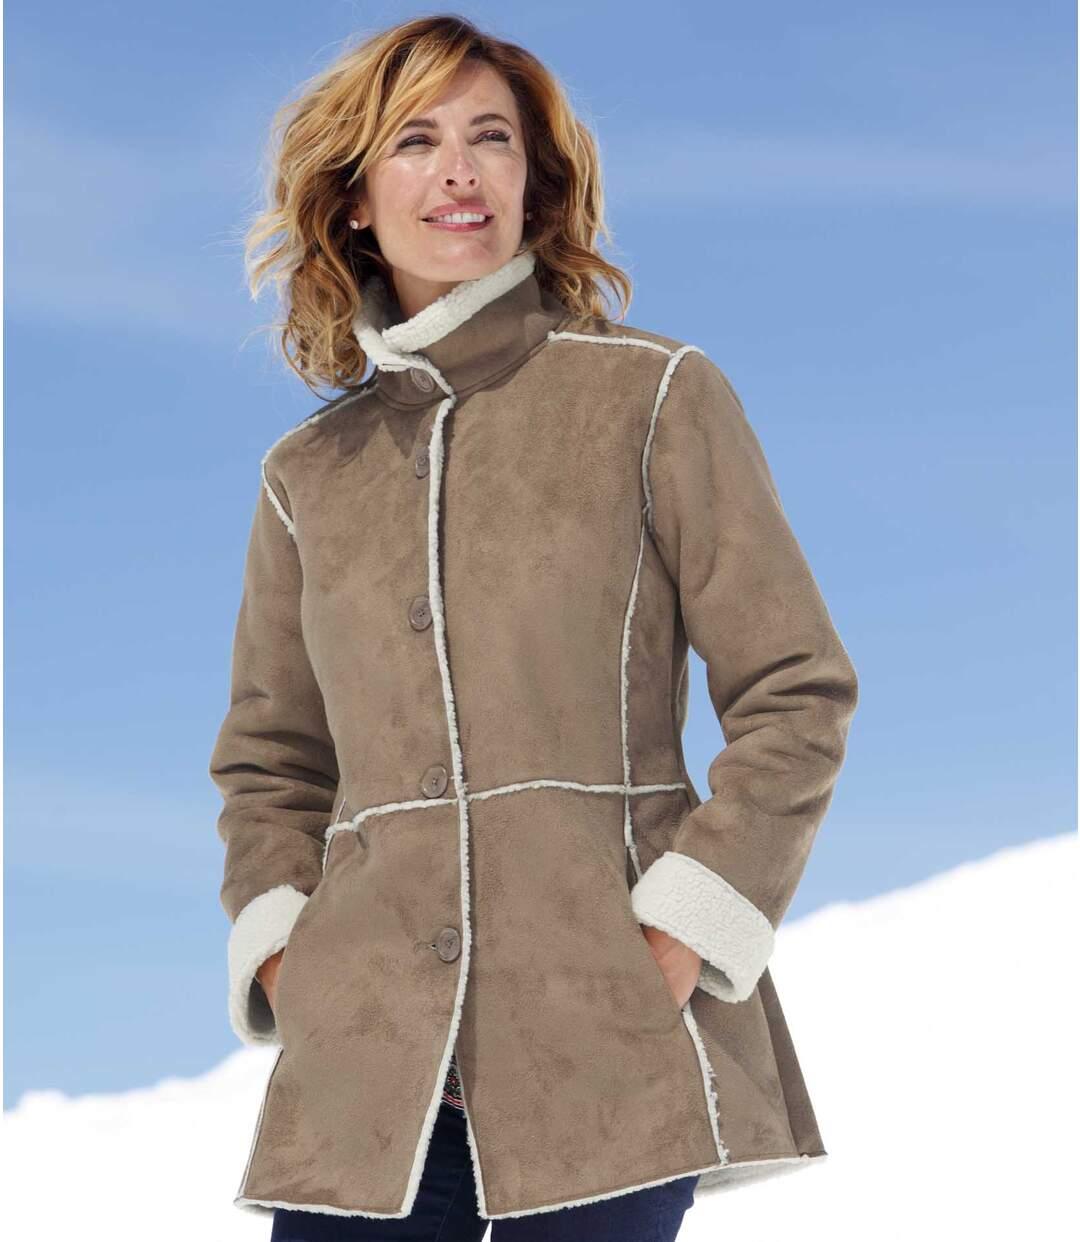 Mantel in Wildlederoptik mit Teddyfutter